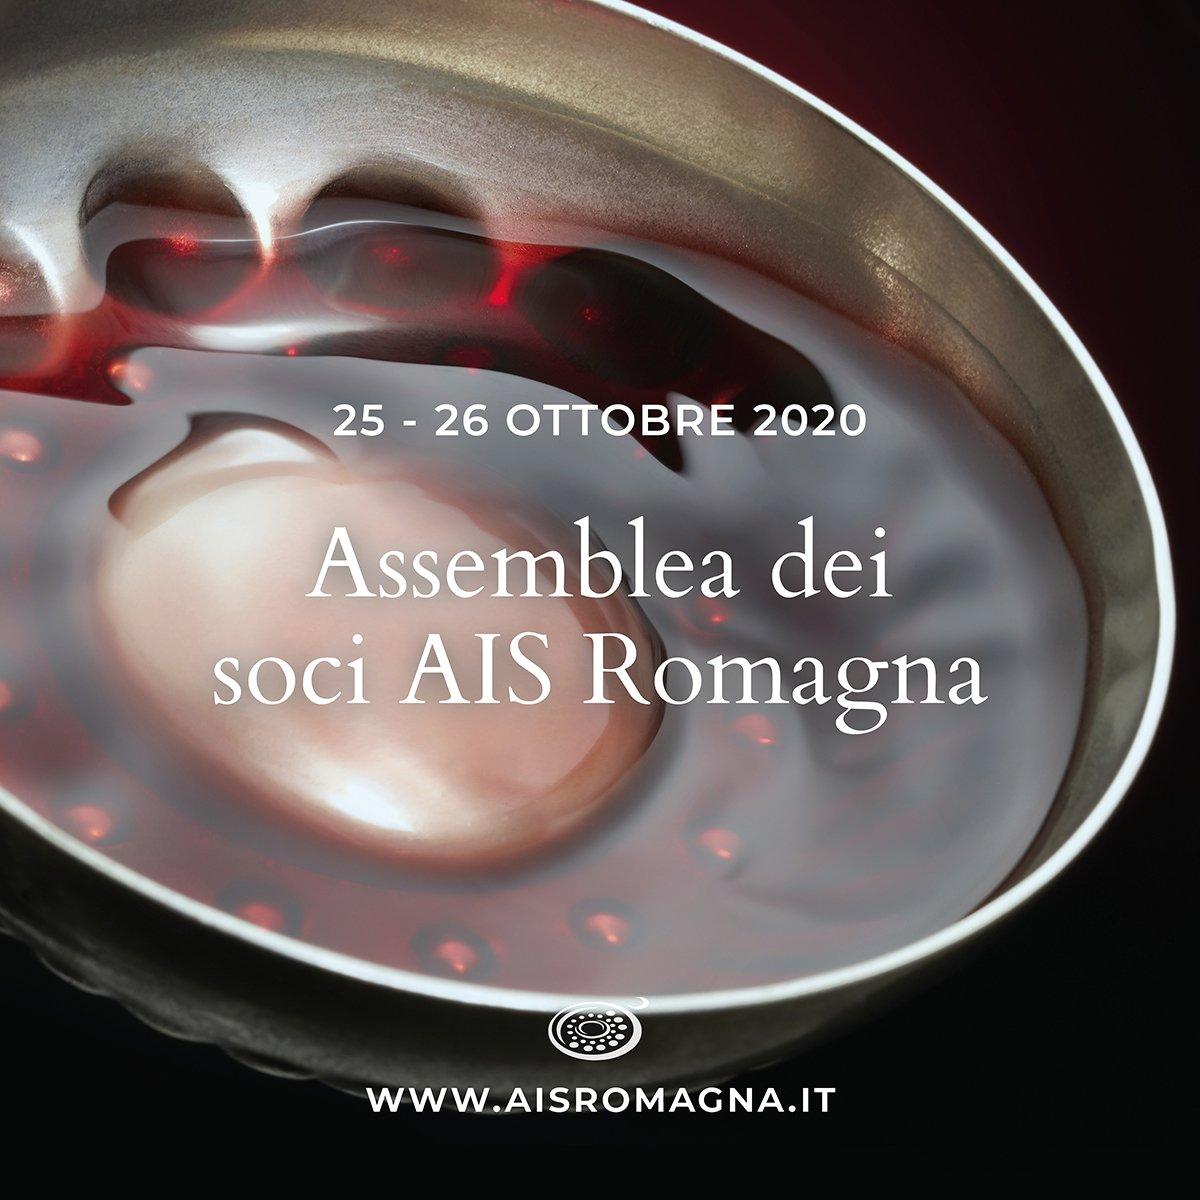 Assemblea dei soci di AIS Romagna